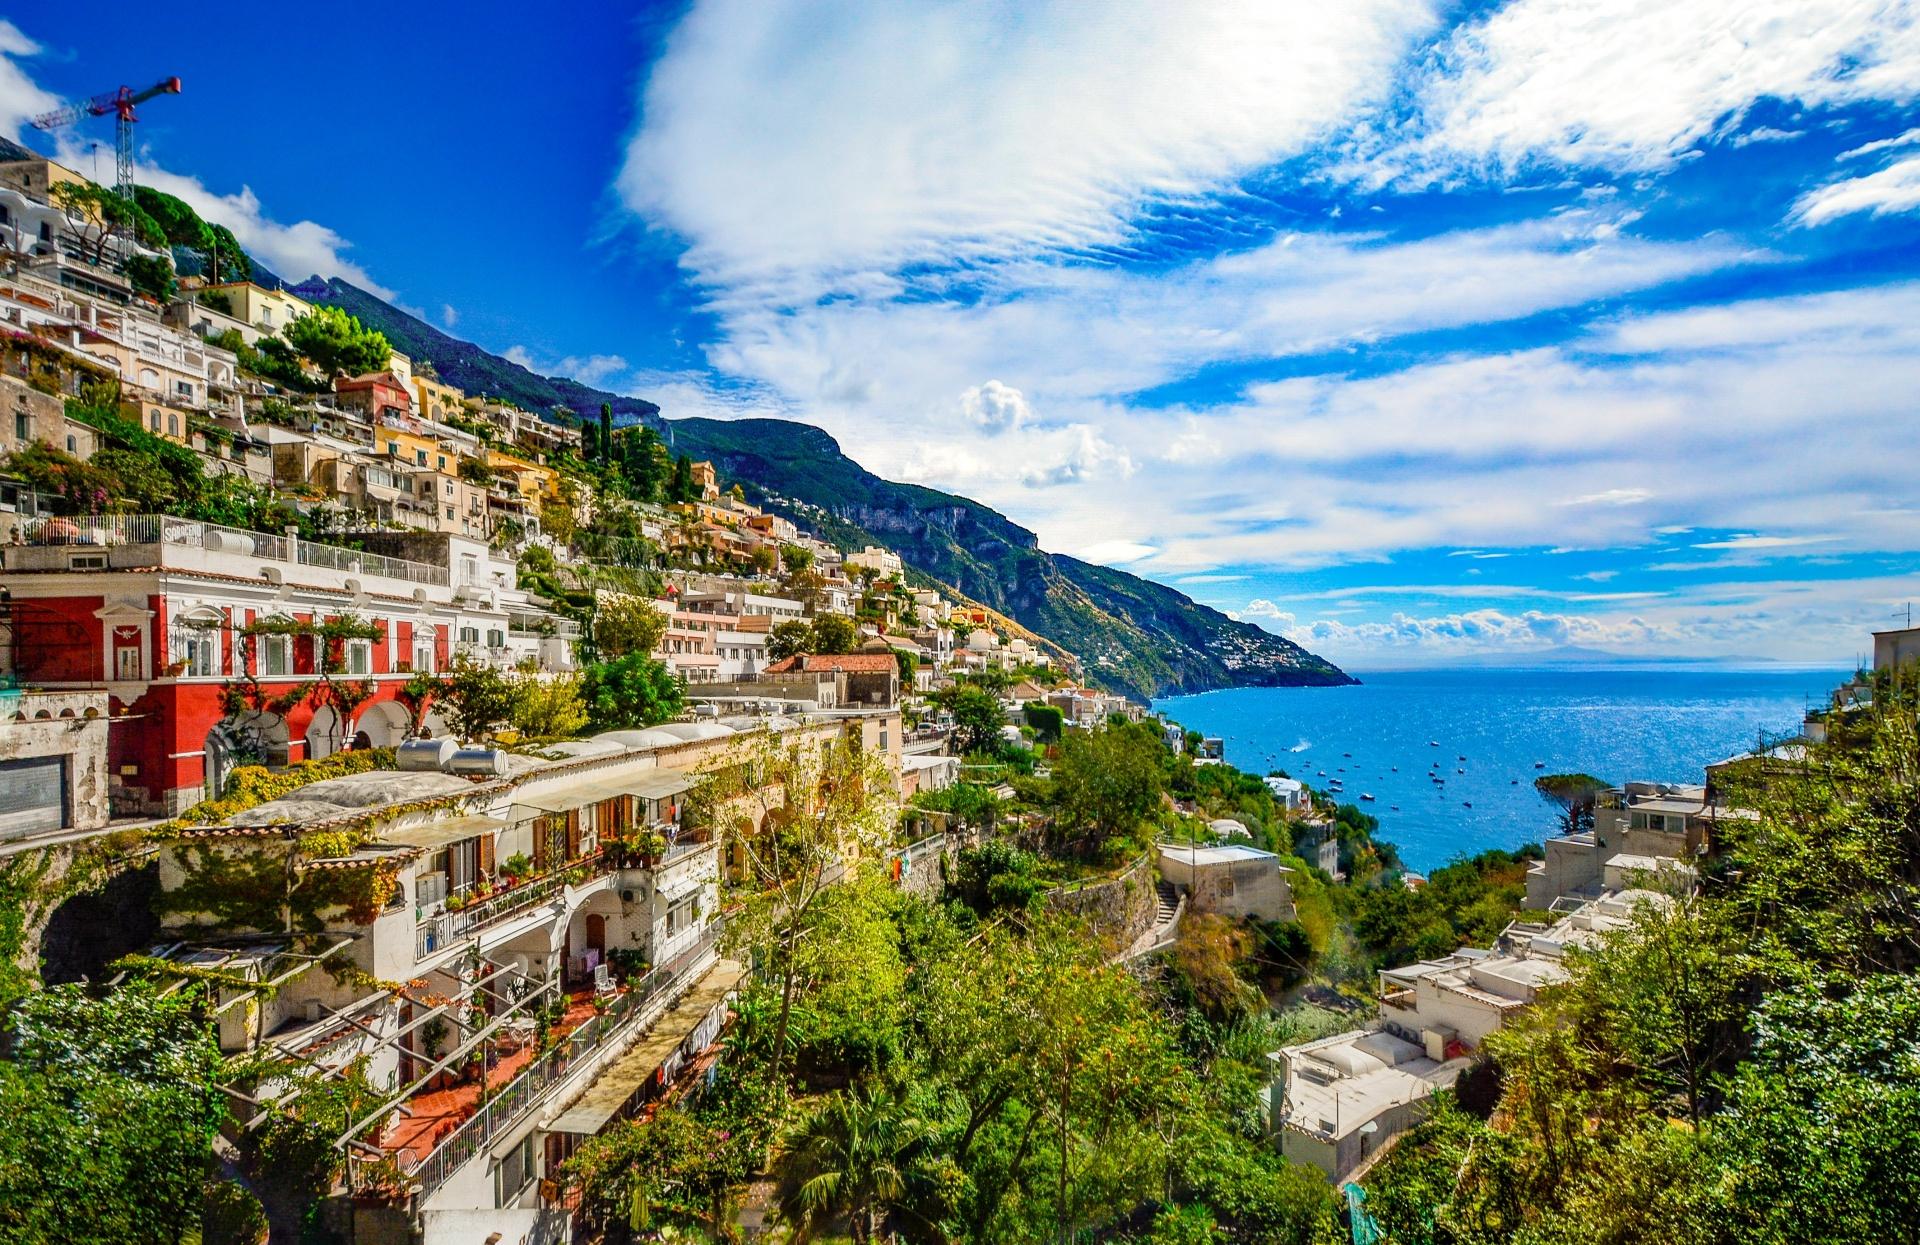 La costa italiana on the road